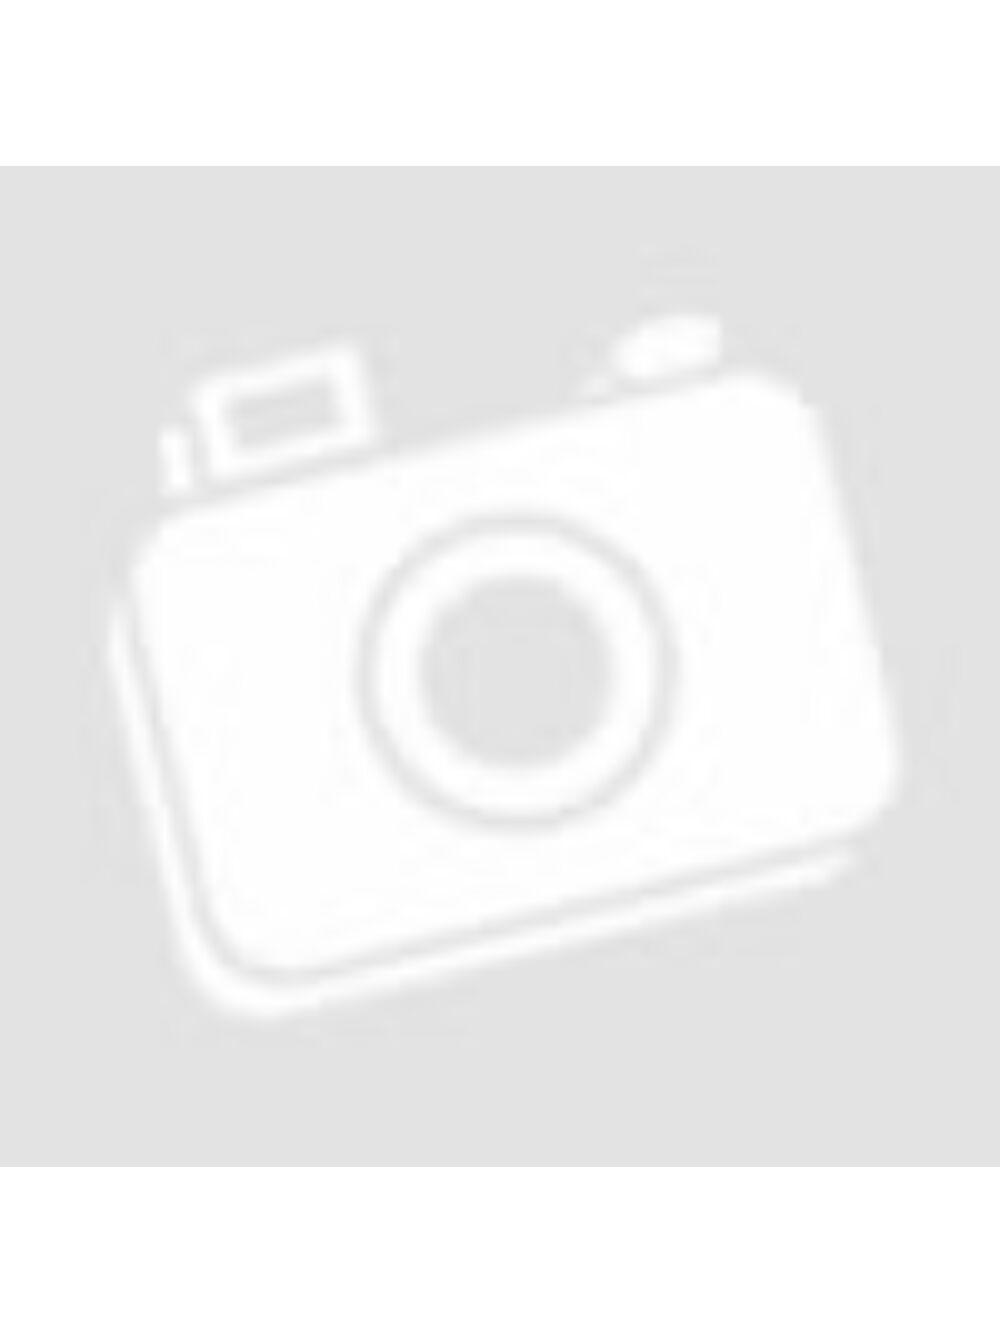 Faragott lepke 10*10cm - Fehér